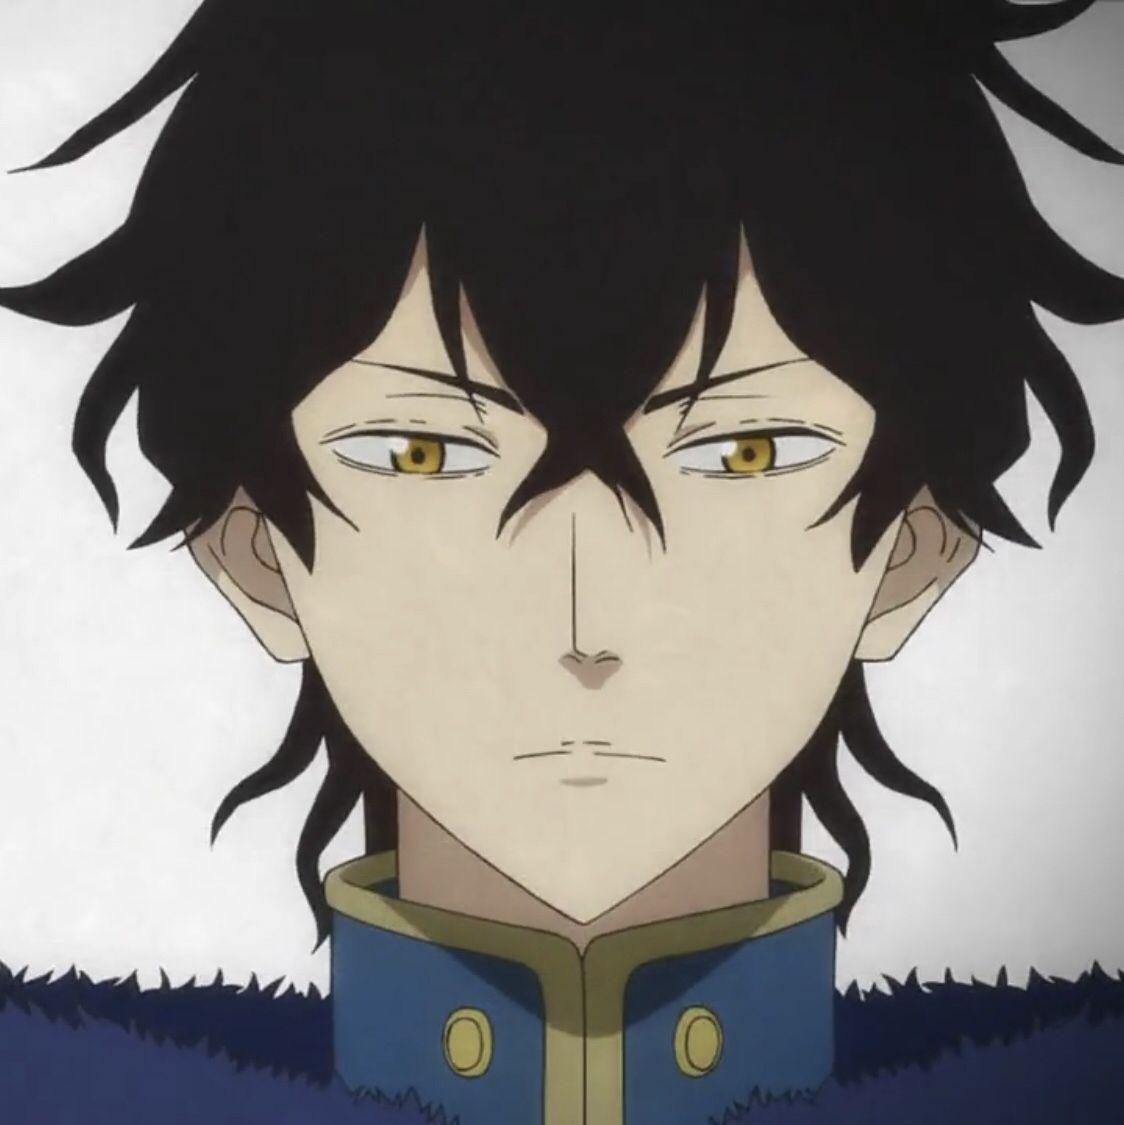 Yuno || Black Clover | Black clover anime, Stray dogs ...